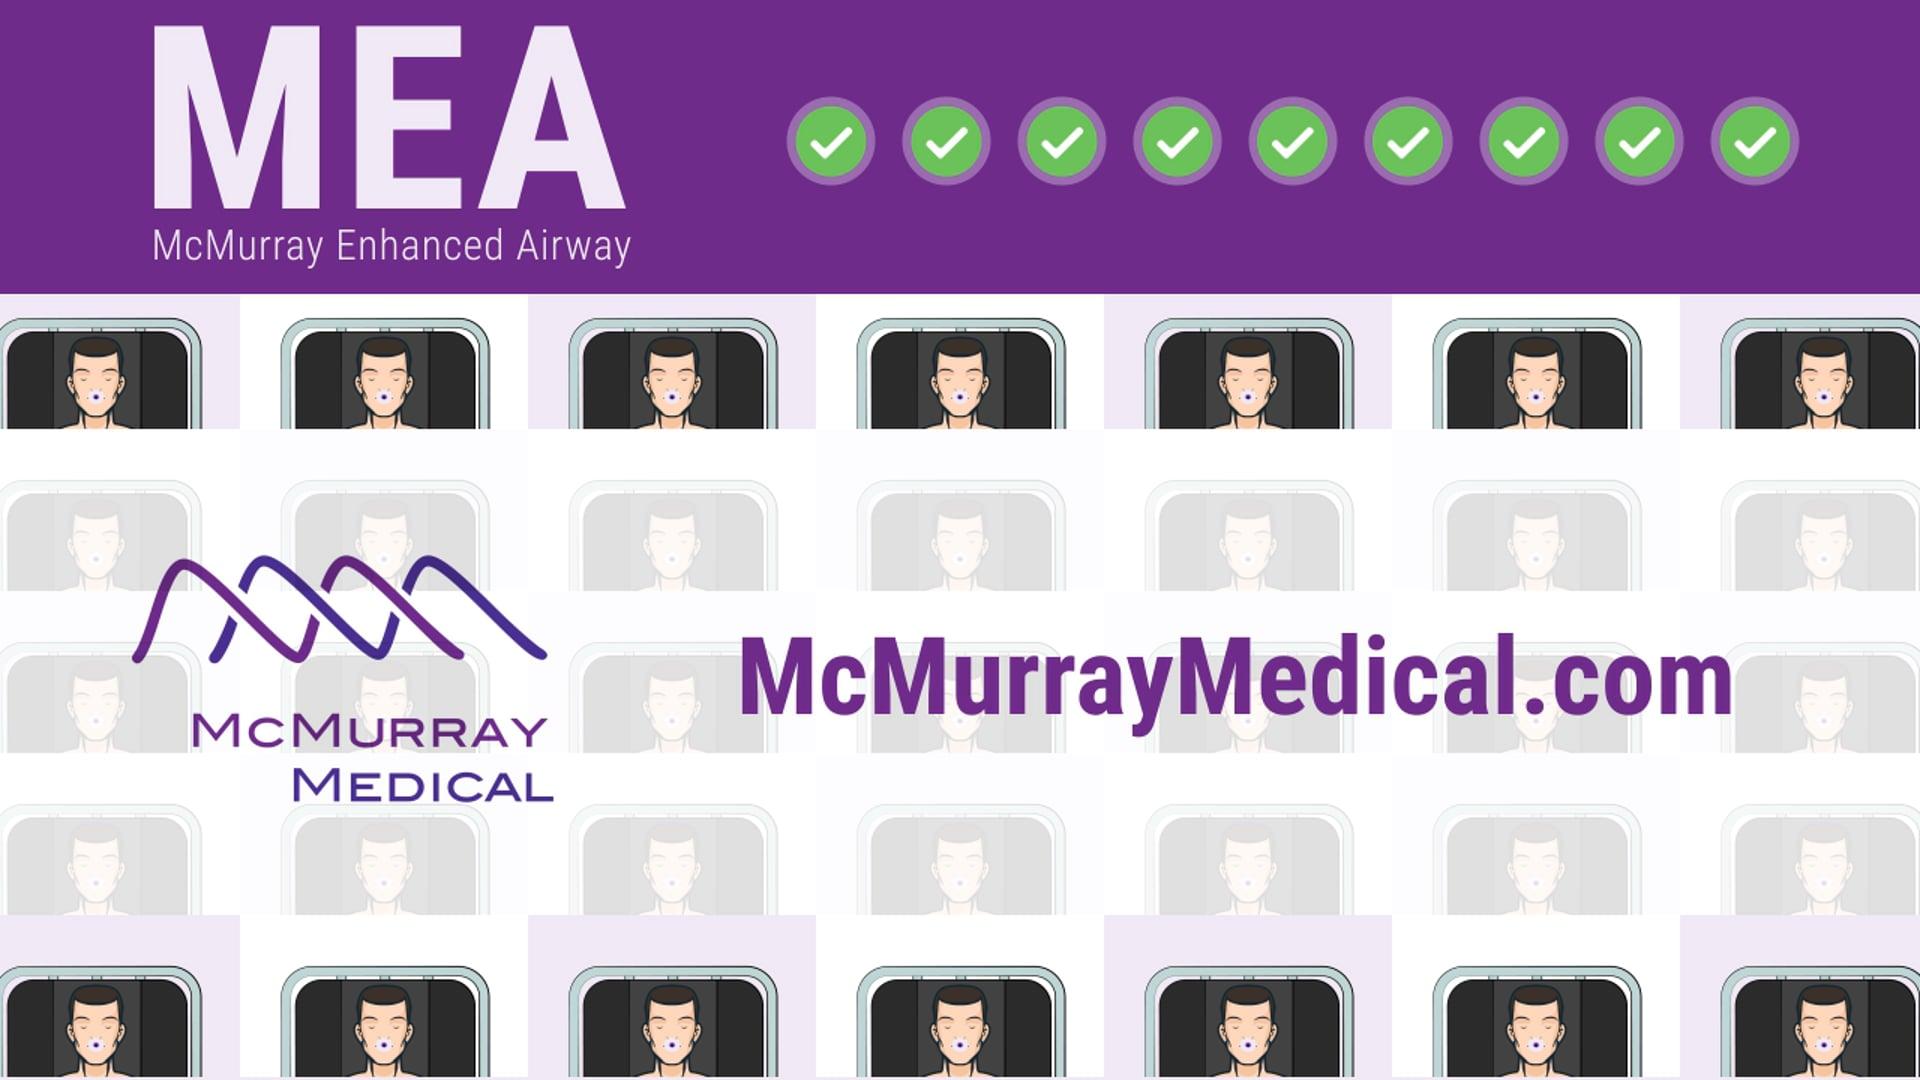 McMurray Medical